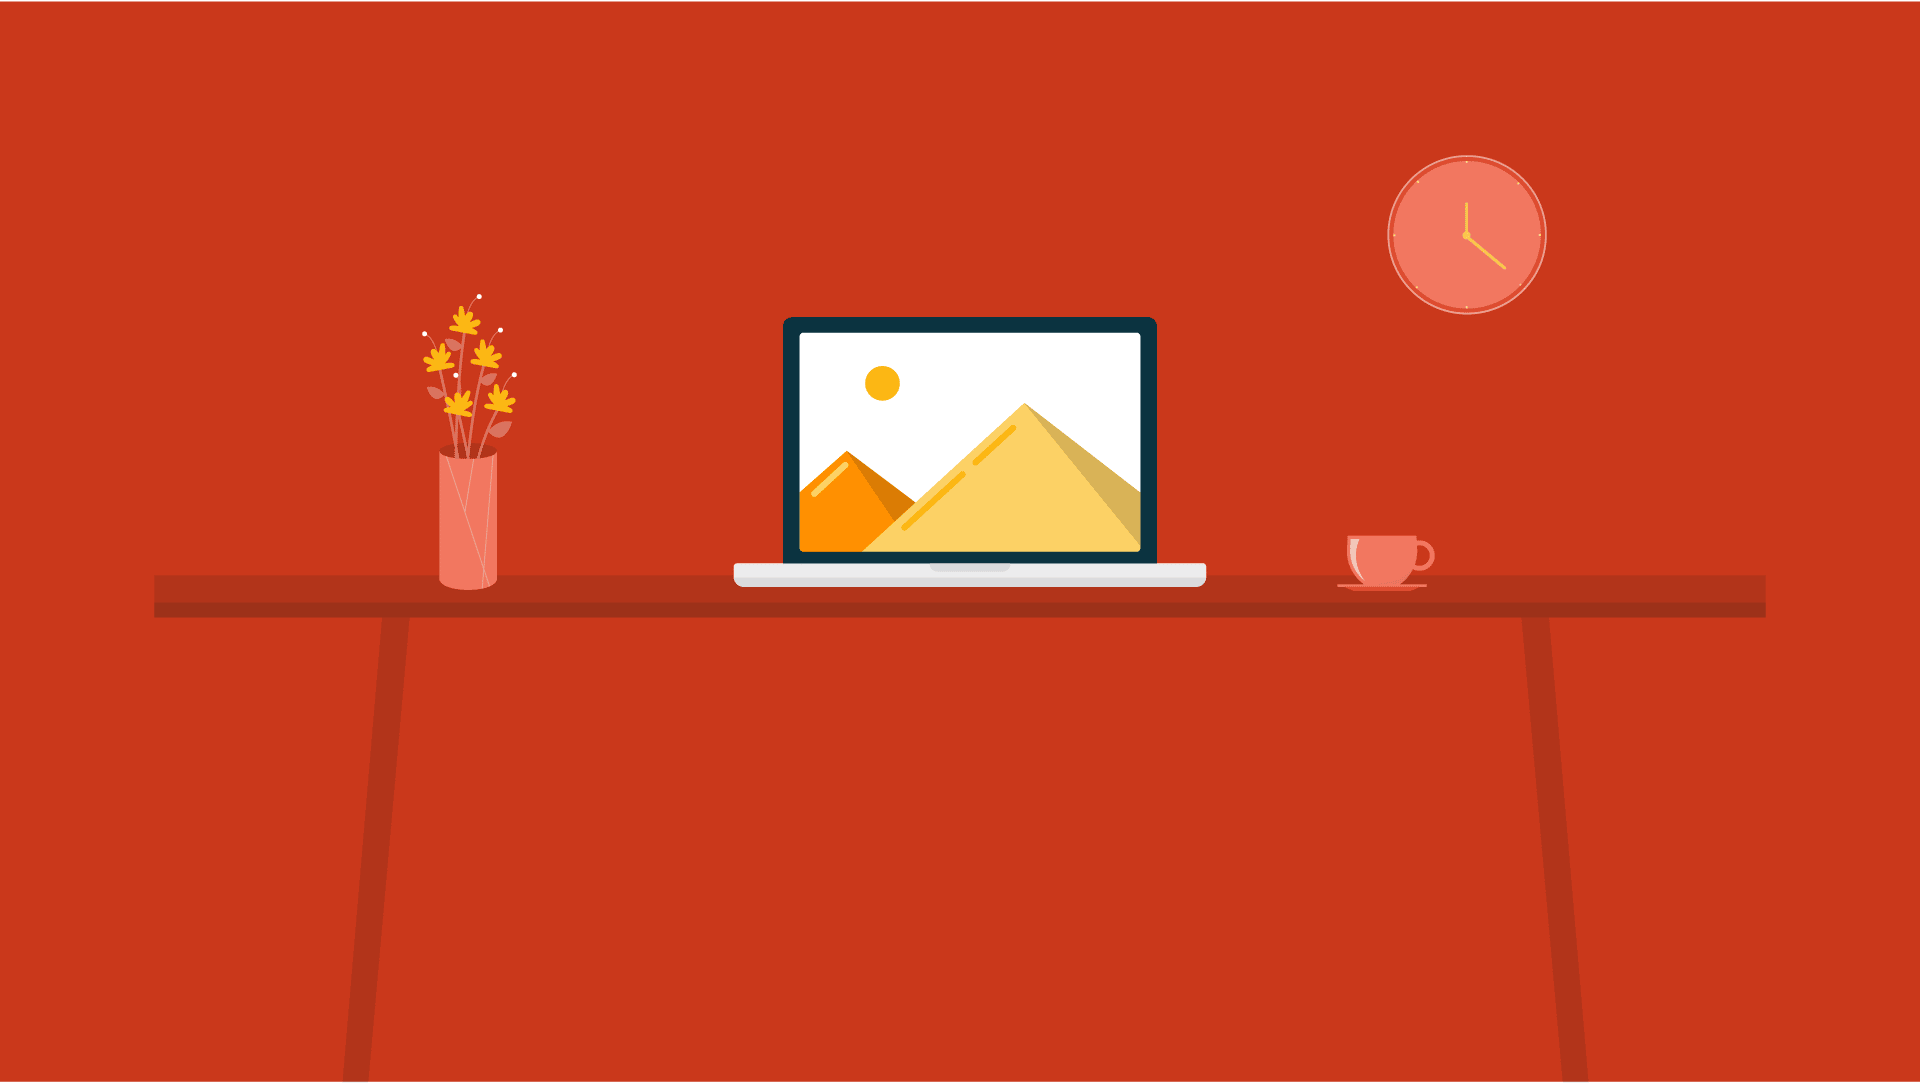 Webinar: 5 Time-Saving PowerPoint Tricks